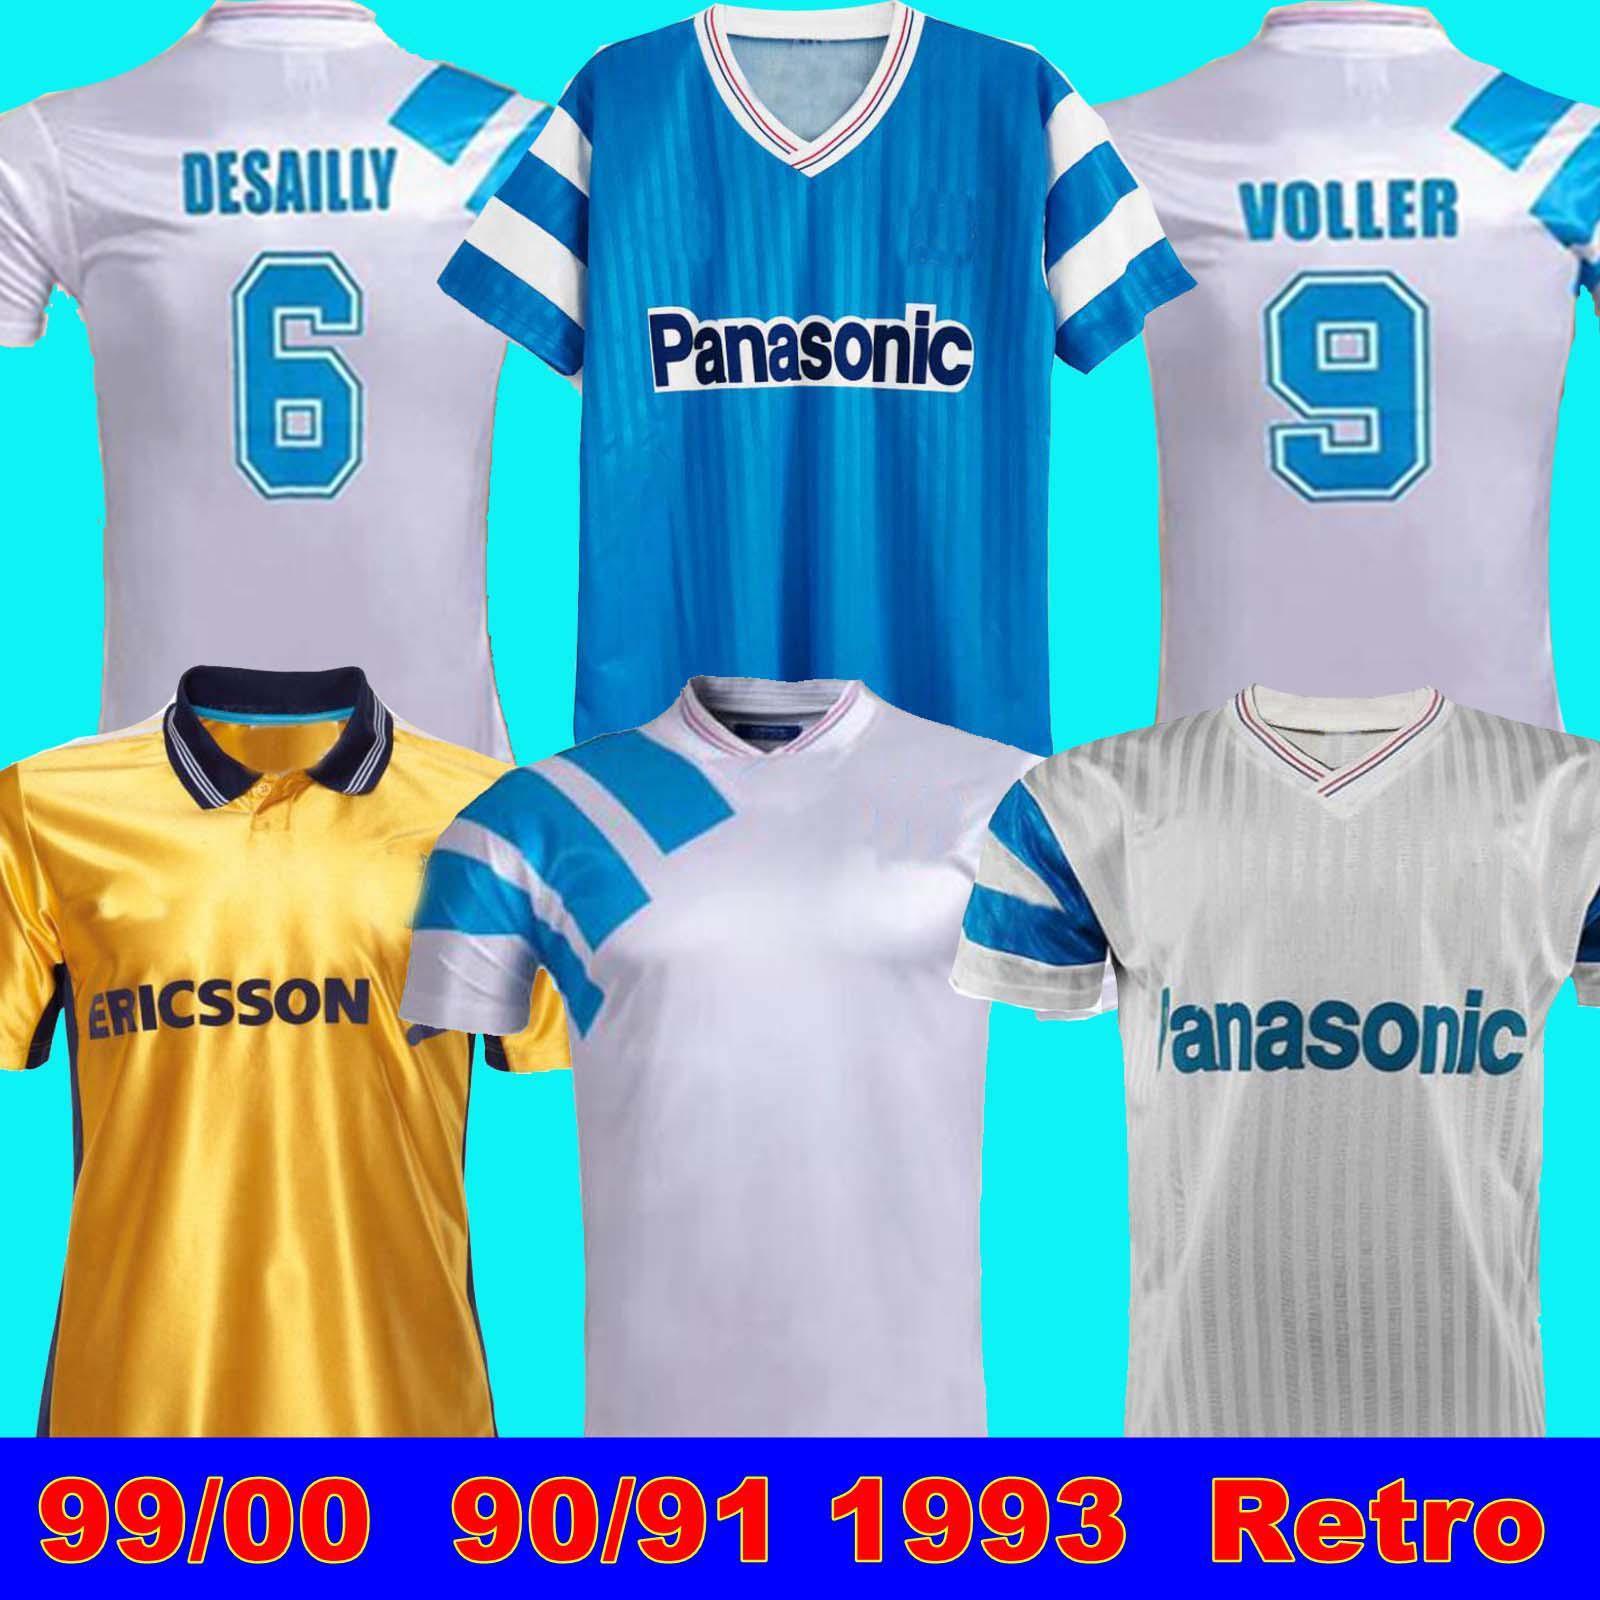 99 00 Olympique De Marseille 축구 셔츠 Deschamps Papin Boli Desailly Voller Retro 98 99 1993 축구 유니폼